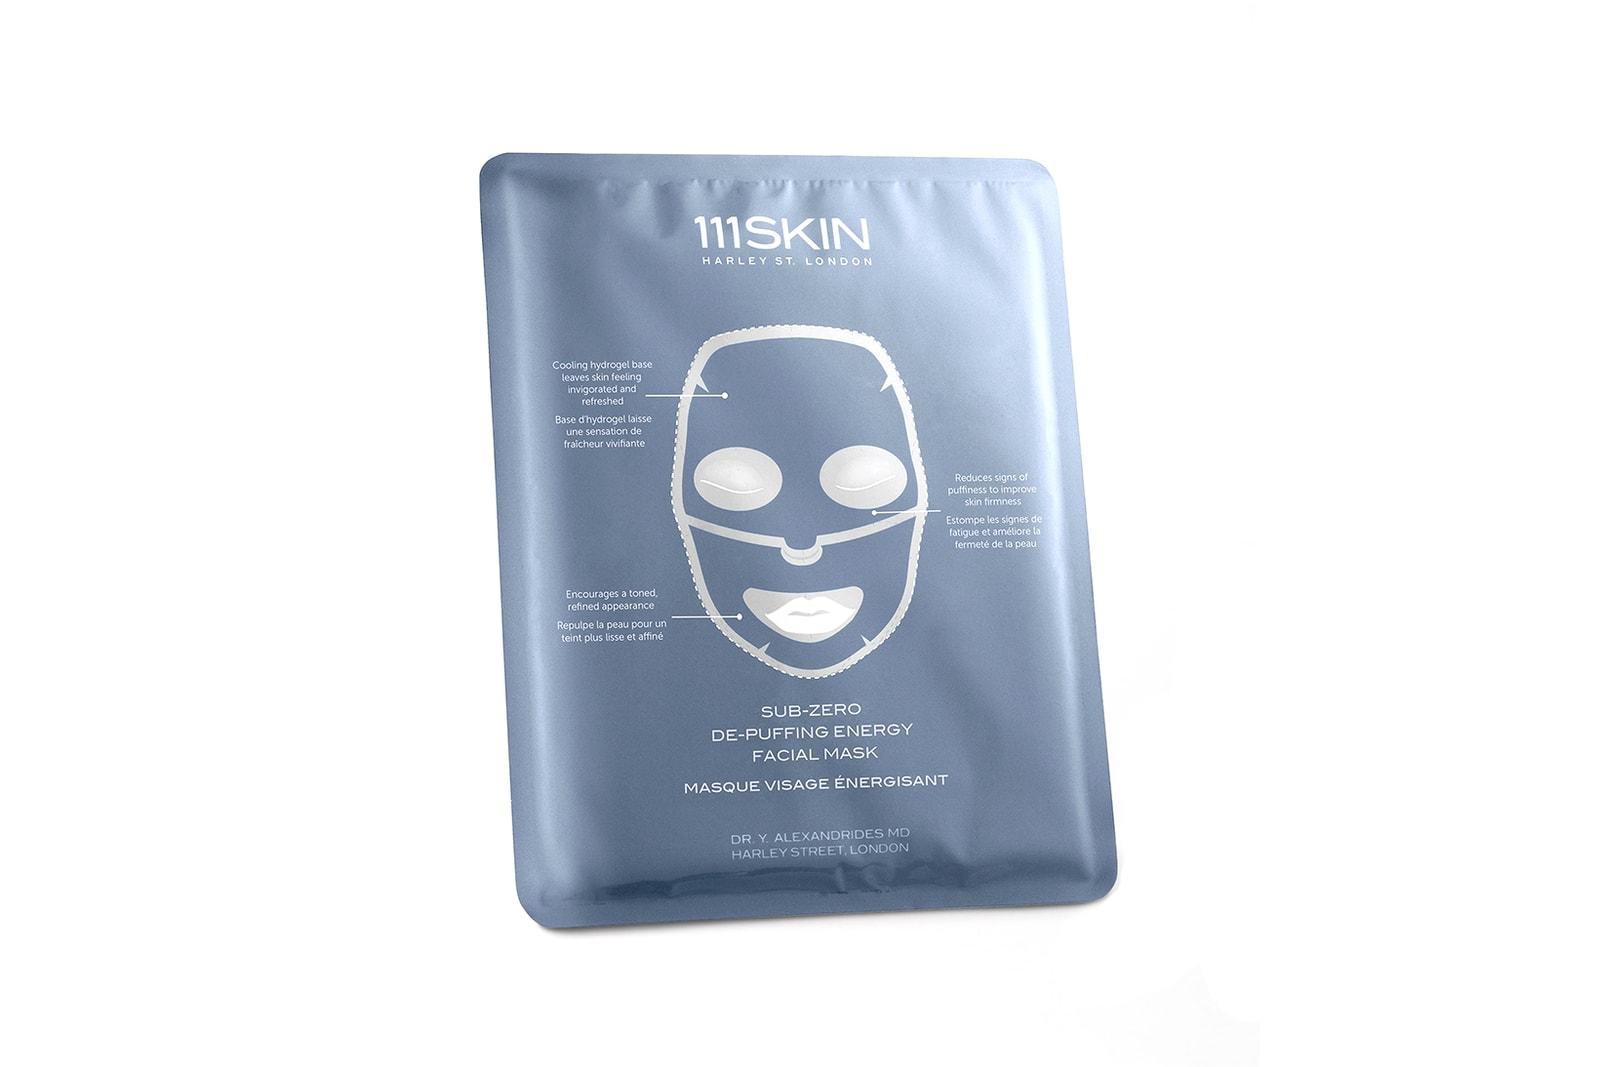 editor reviews products at home spa day 111skin eye face masks body oil jade roller tekla bathrobe